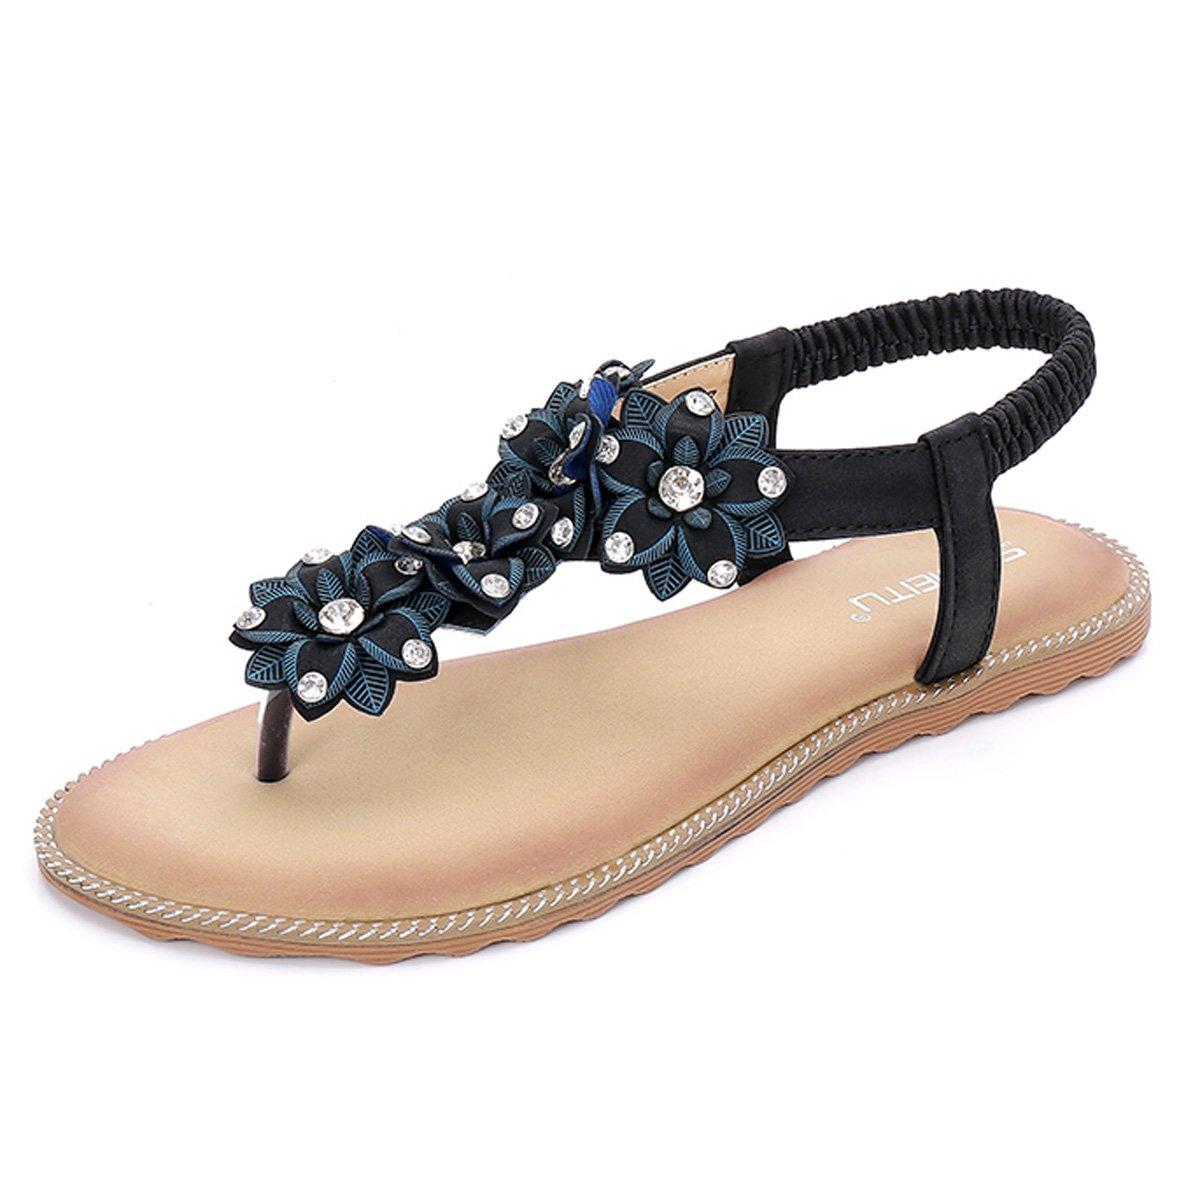 gracosy Damen Sandalen, Flip Flops Sommer Sandals Flach Zehentrenner T-Strap Offen Bouml;hmische Strand Schuhe  39 EU|Schwarz-b